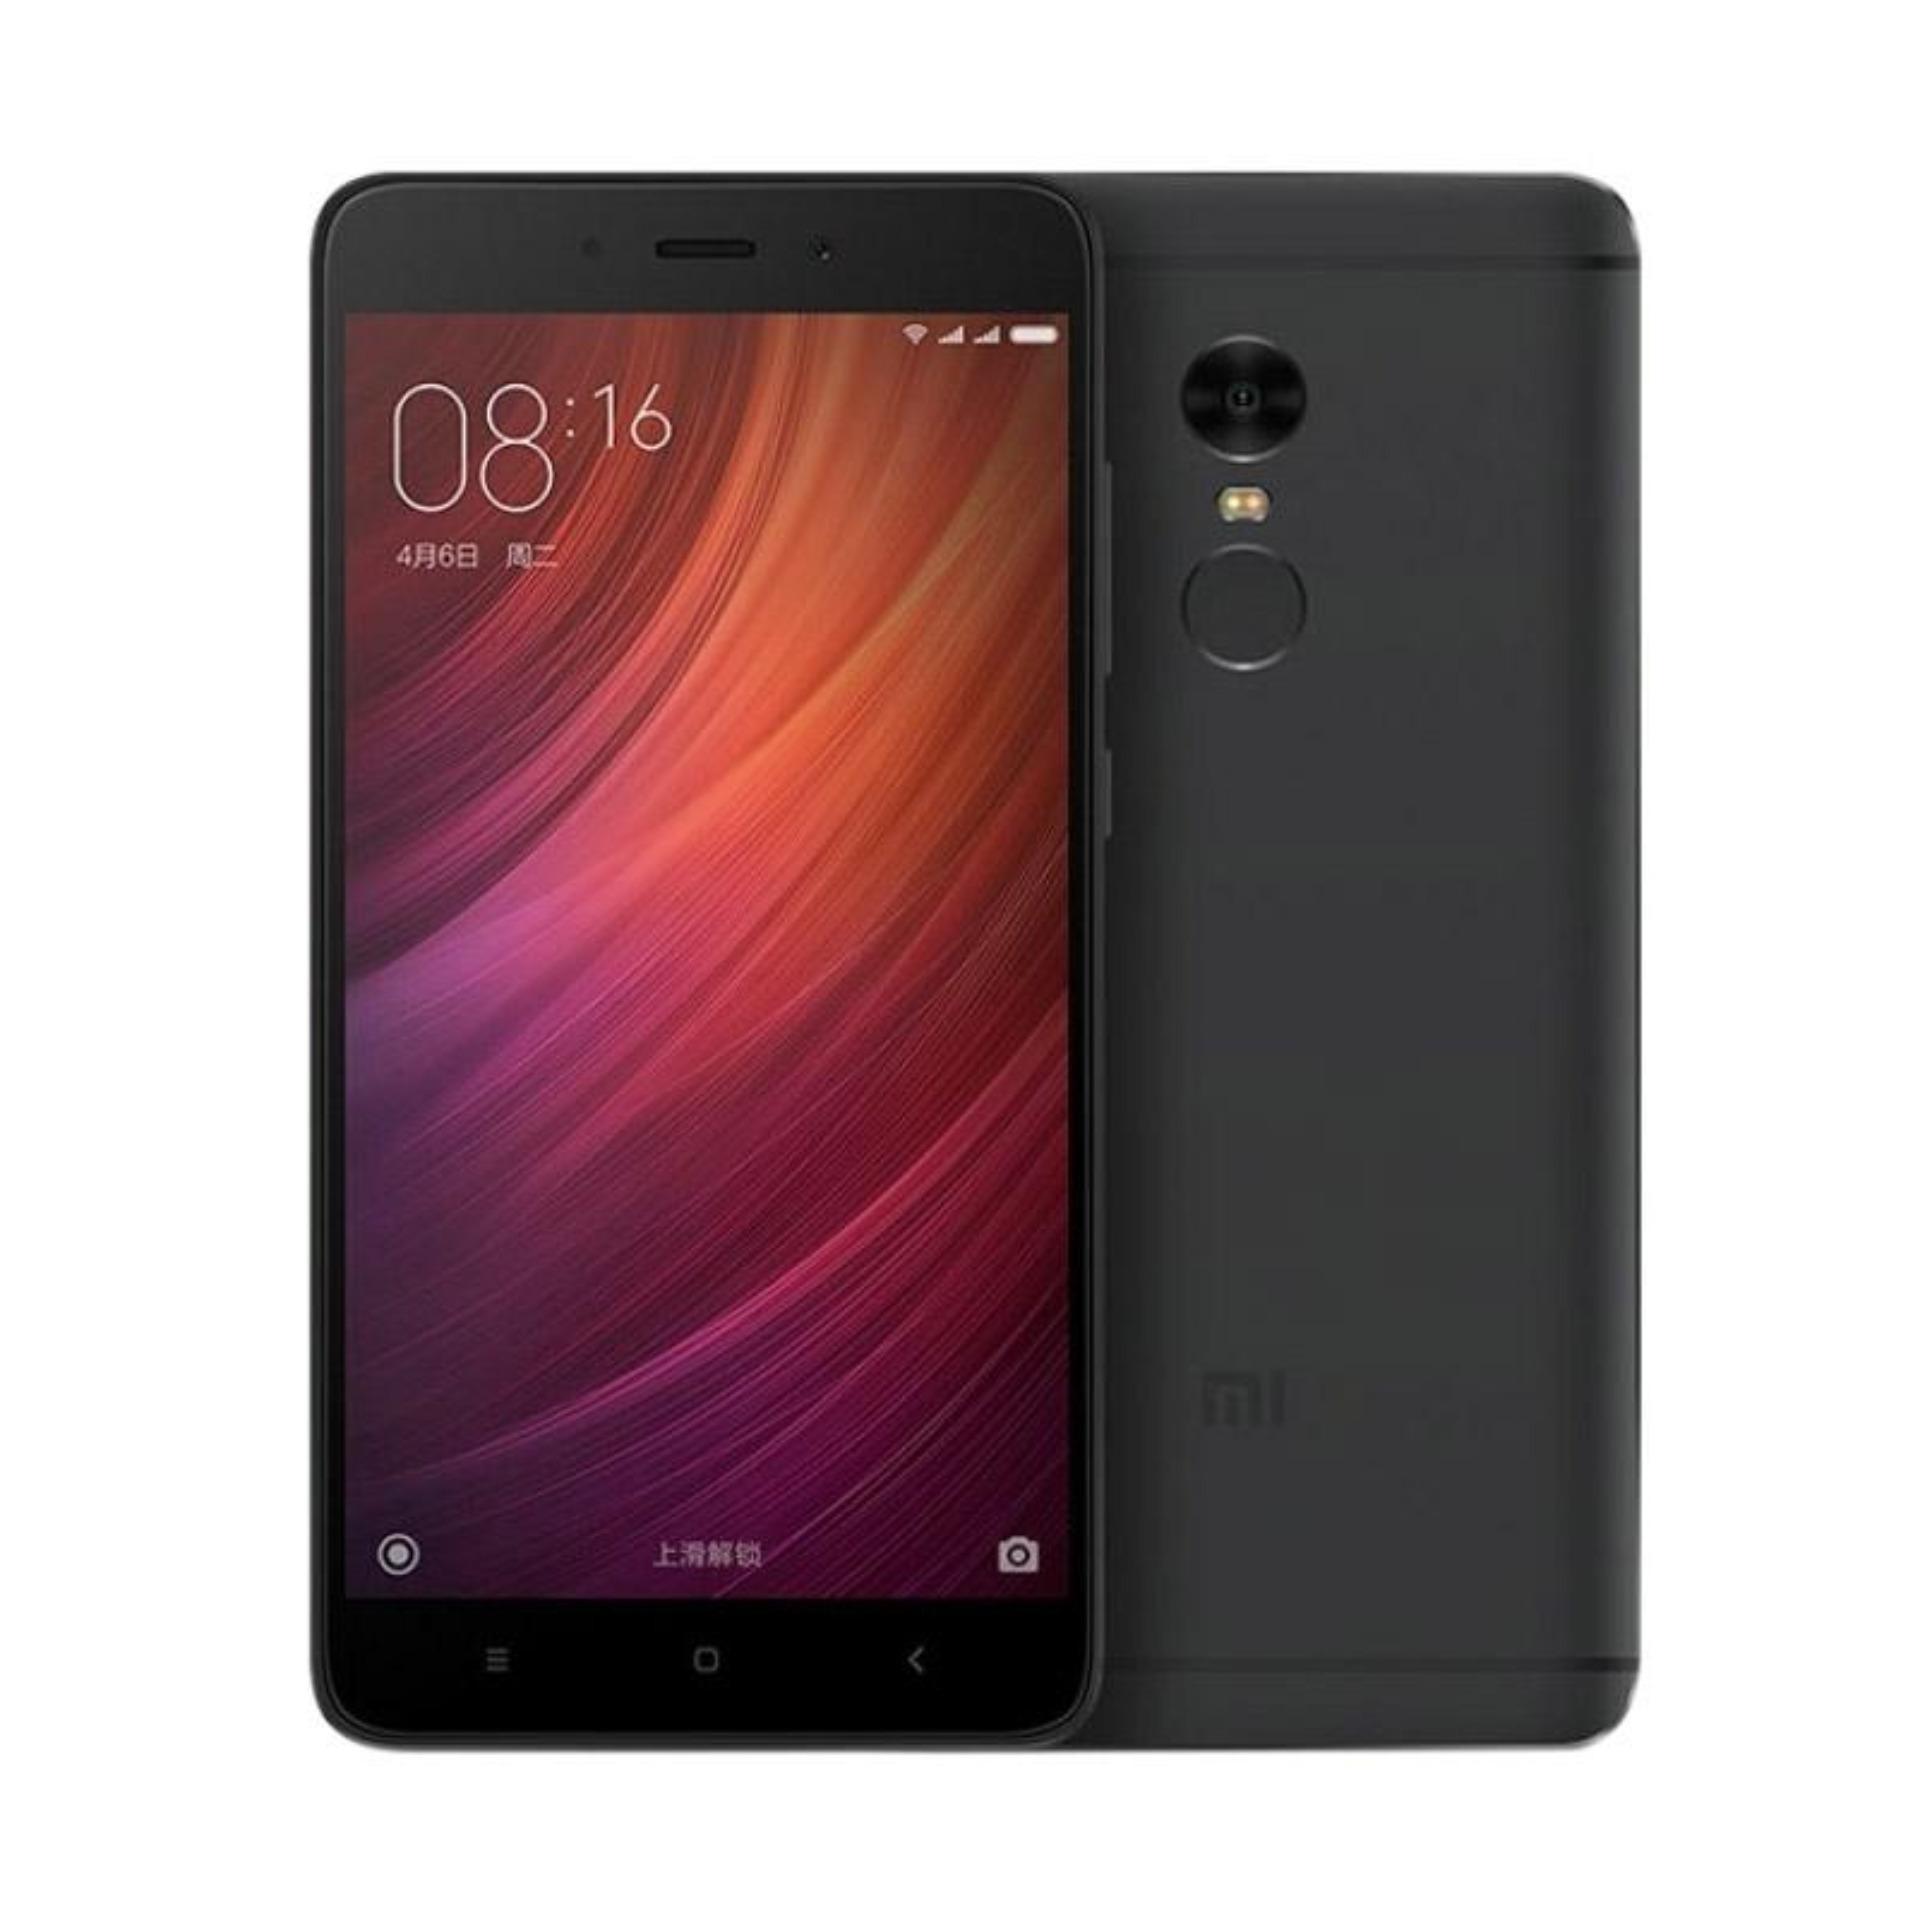 Diskon Hp Xiaomi Redmi Note 5a Ram 2gb Internal 16gb Gold Grs Xiomi Ram2 Garansi Resmi Tam Distributor 4 4gb Rom 64gb Snapdragon